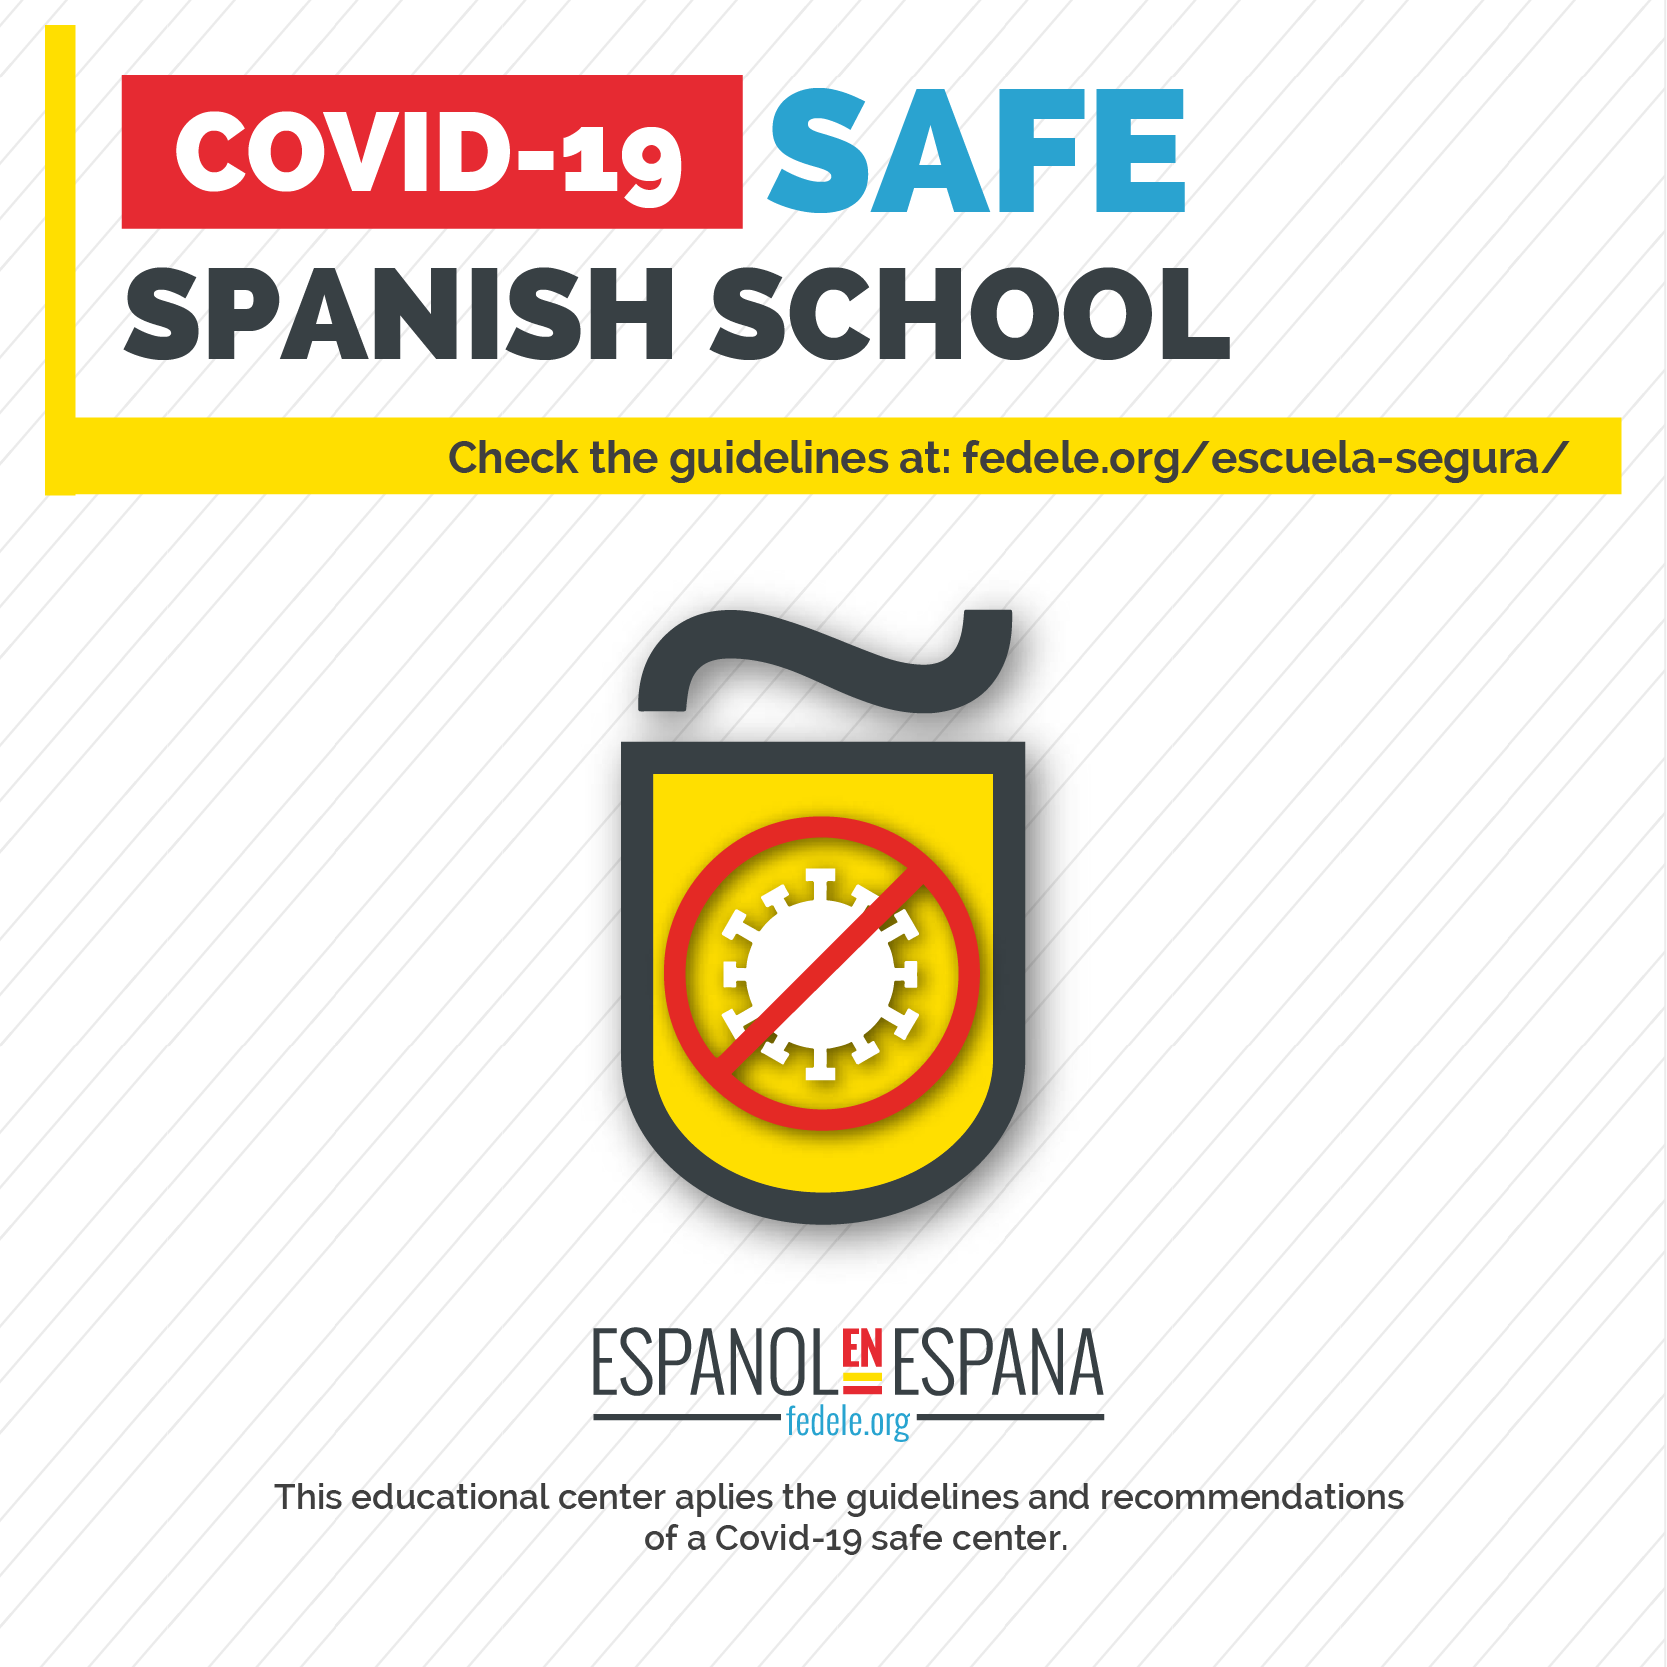 COVID-19 SAFE SPANISH SCHOOL